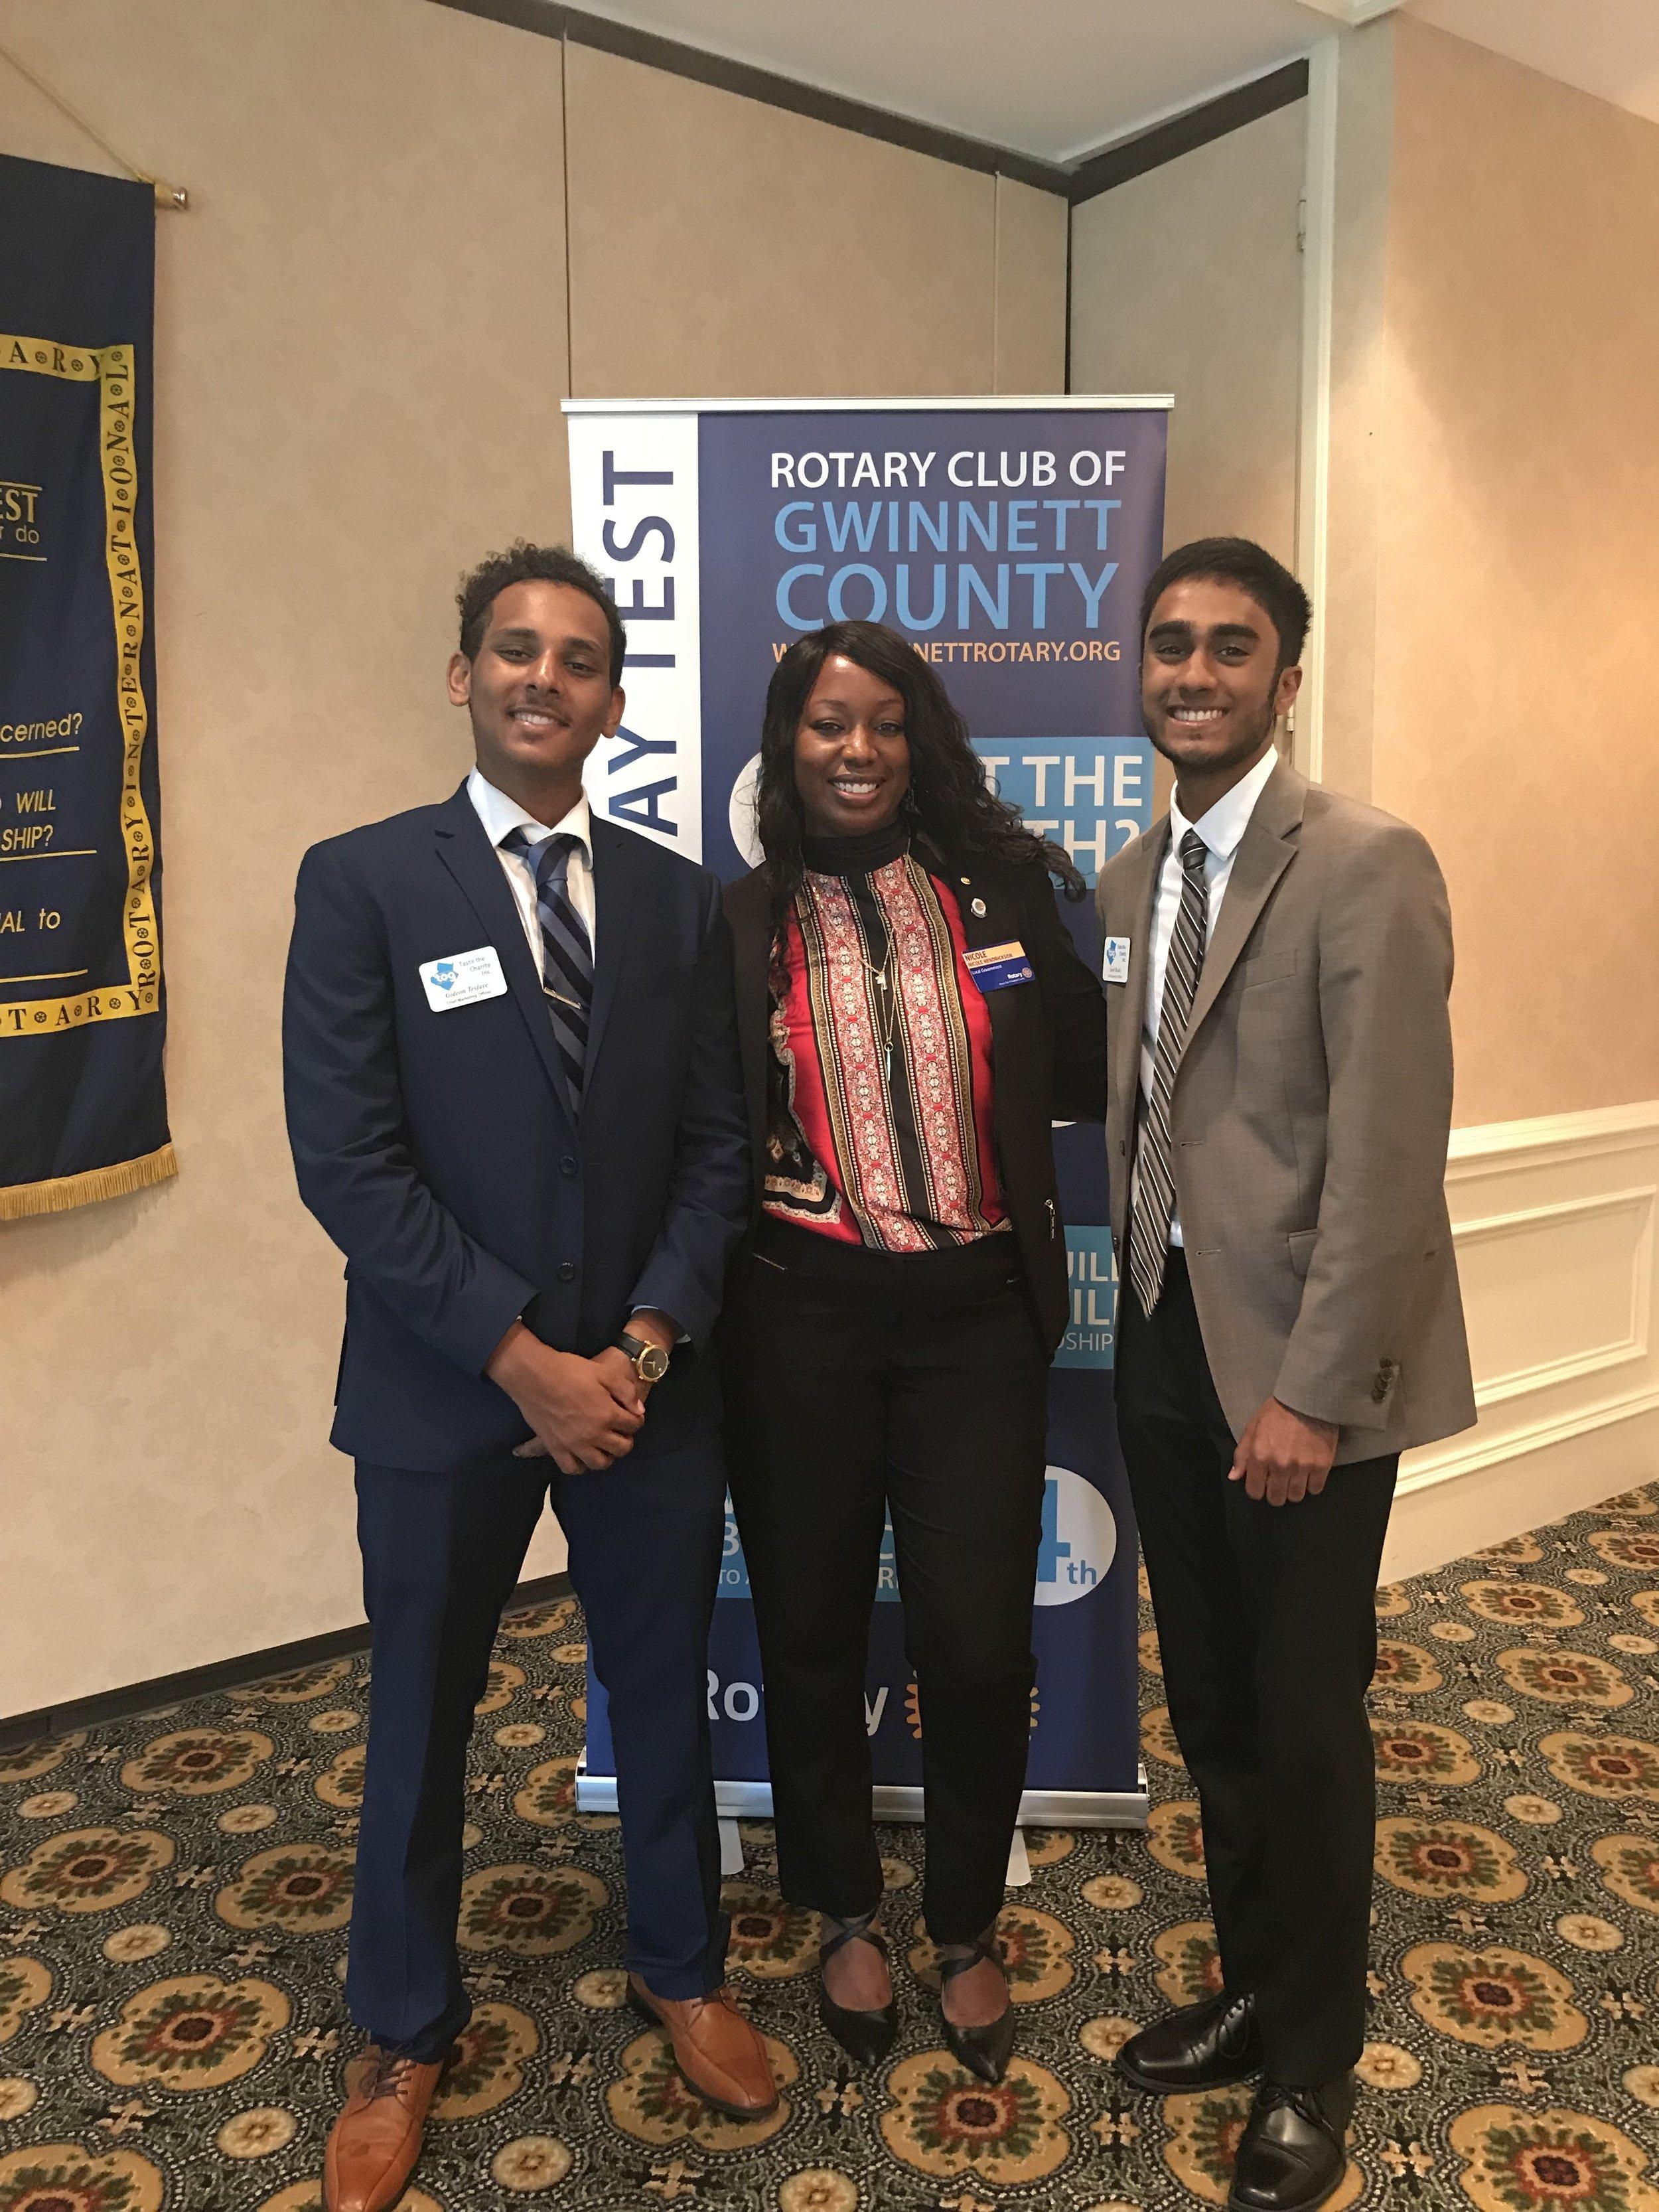 Attending the Gwinnett Rotary with Nicole Hendrickson (Gwinnett County's Community Outreach Director)